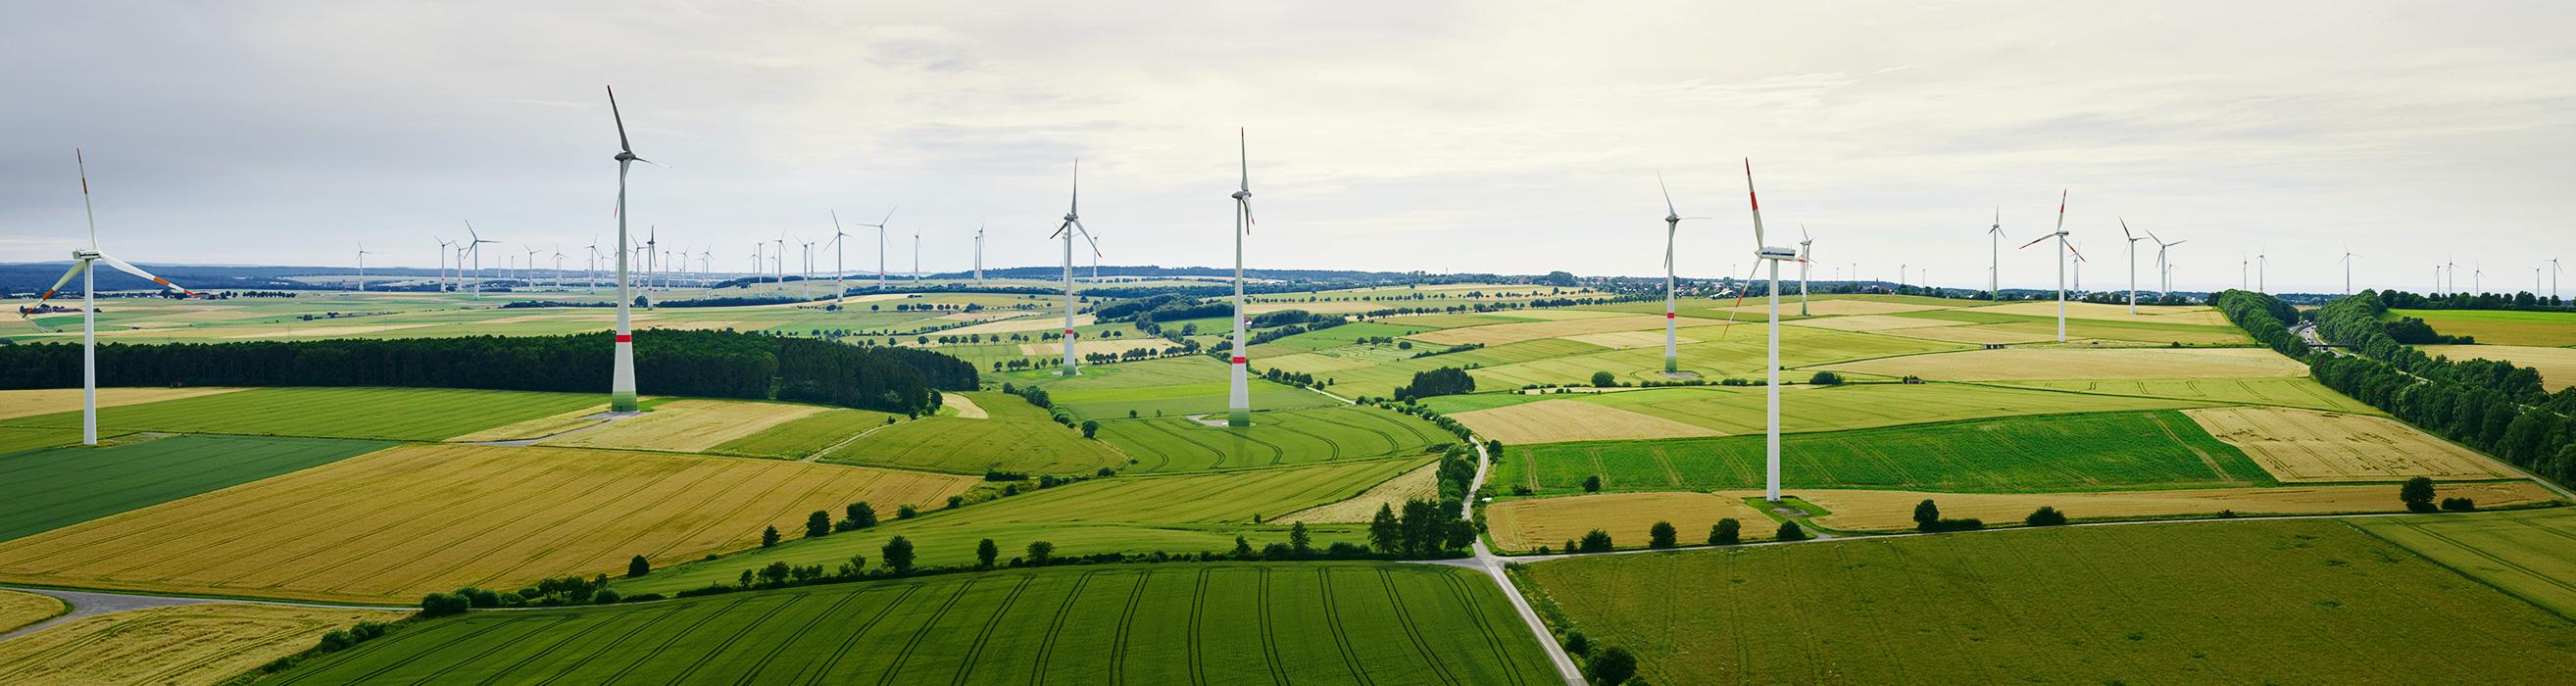 kopterwork windkraft 08